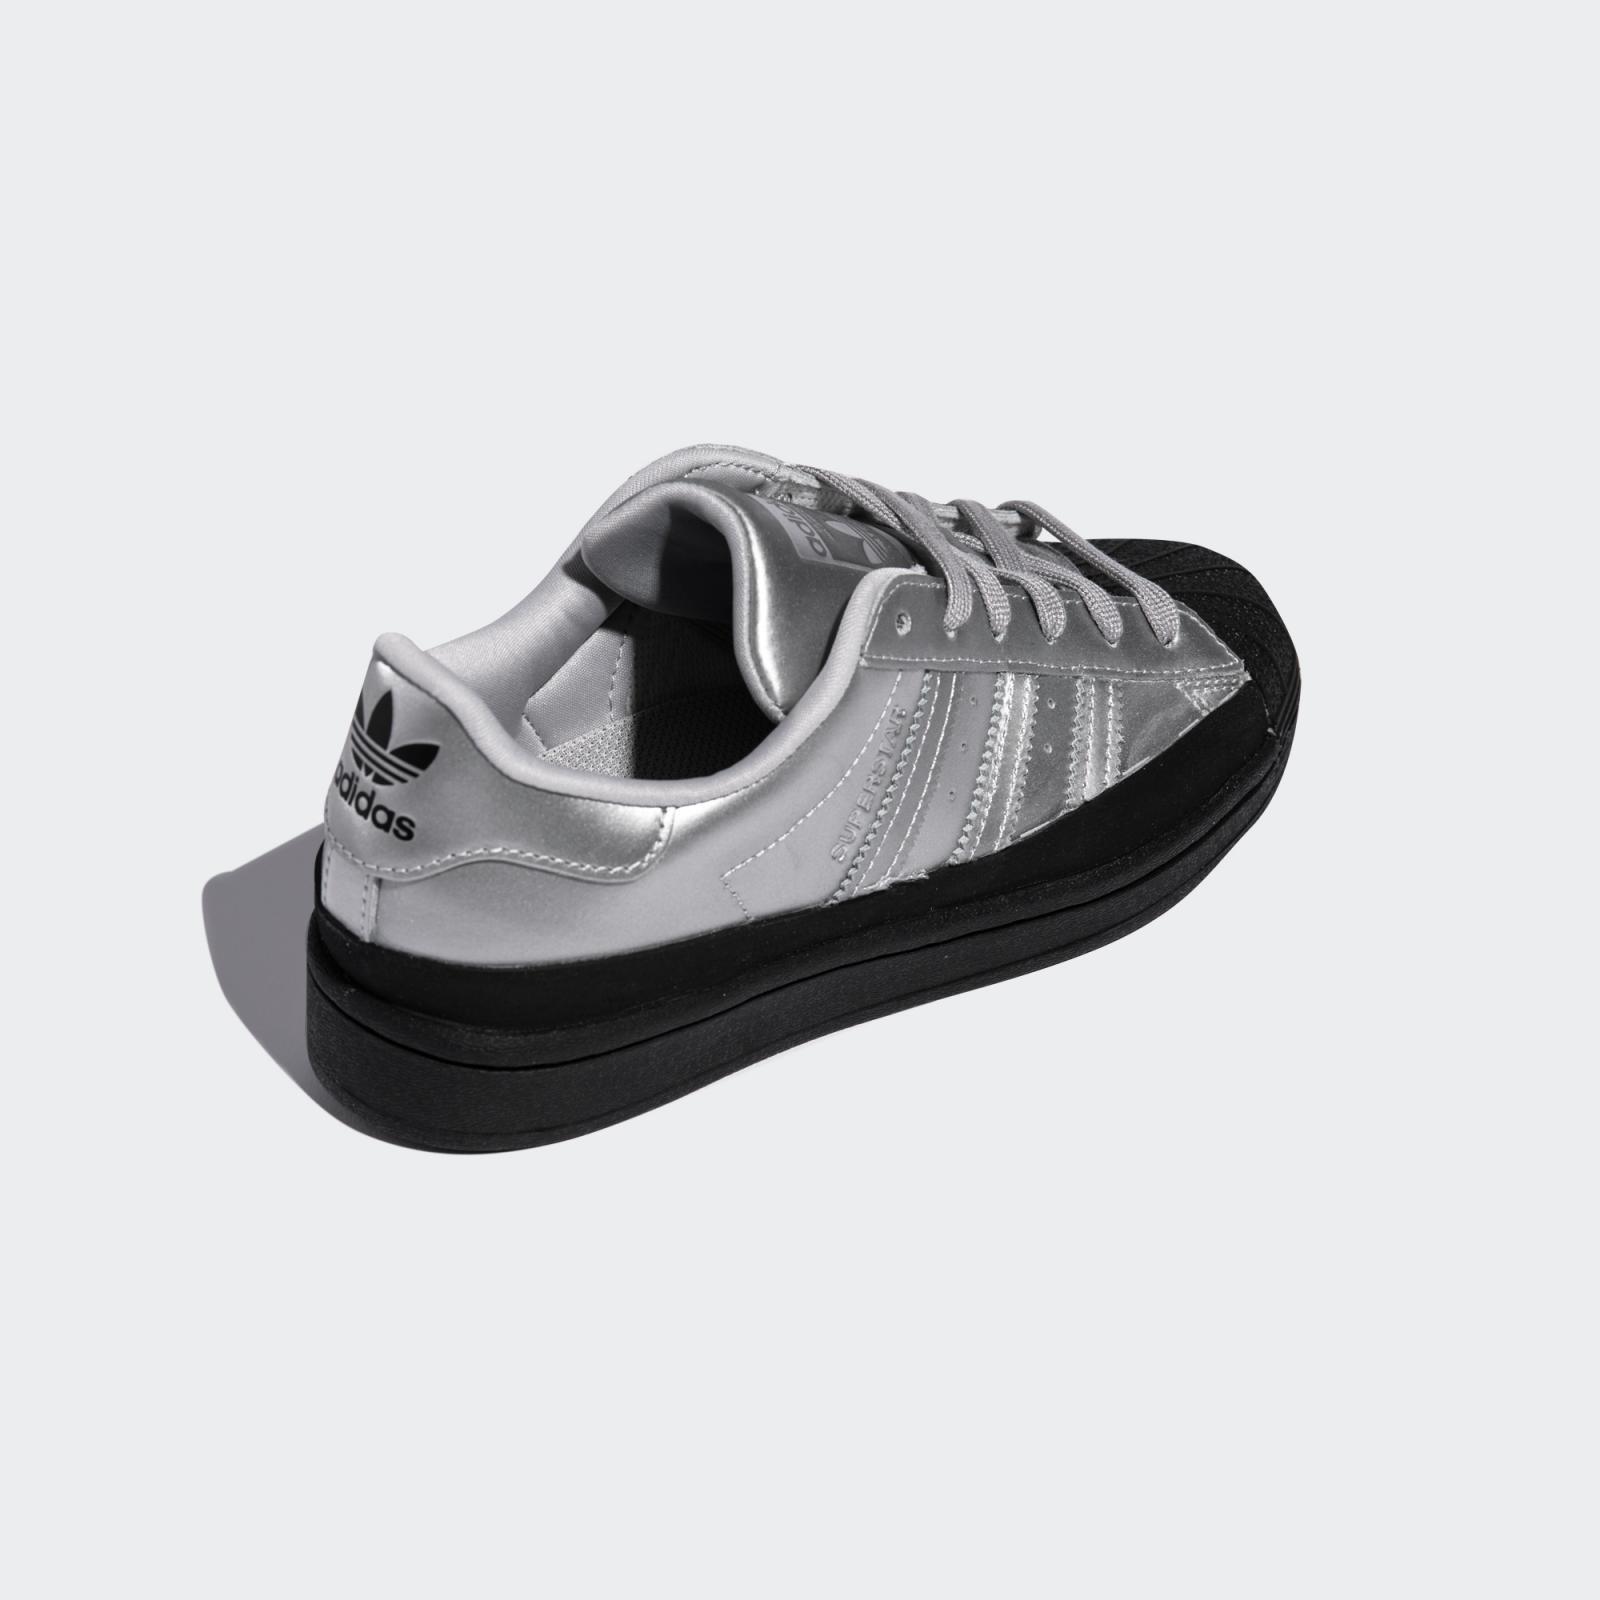 adidas Originals推出全新银/黑色WMNS Superstar